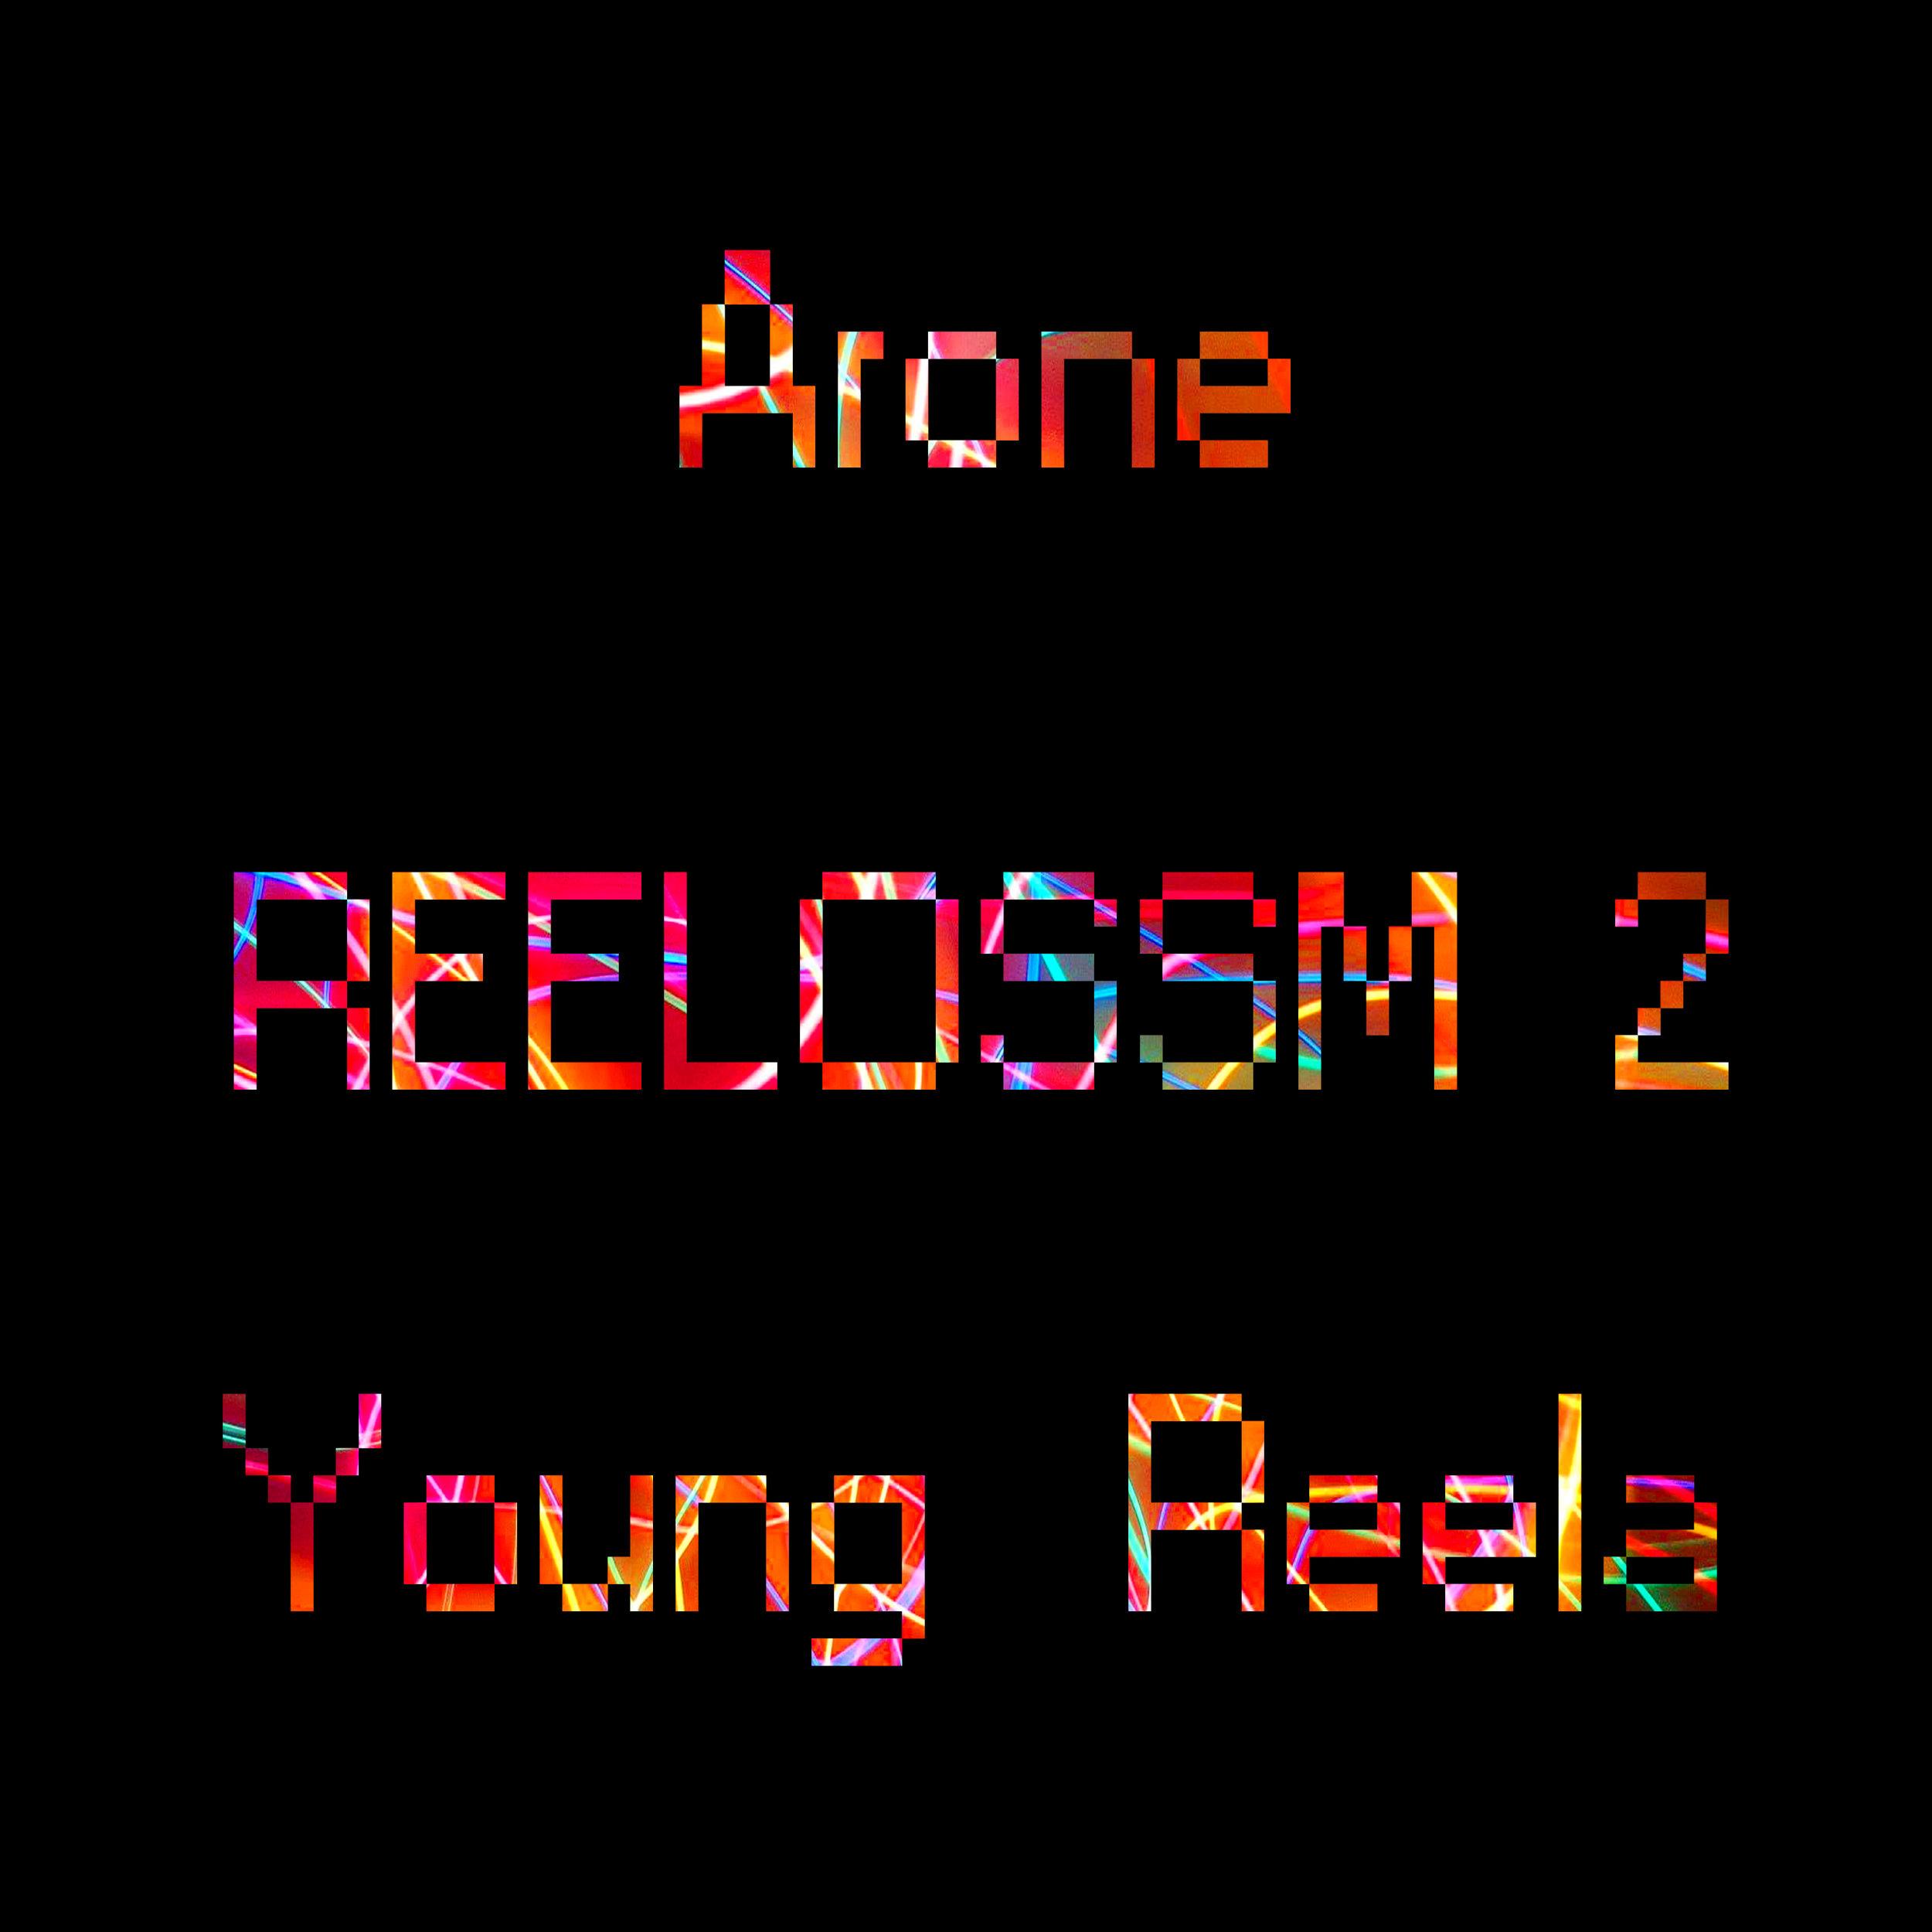 ReelOSSM 2 cover.jpg